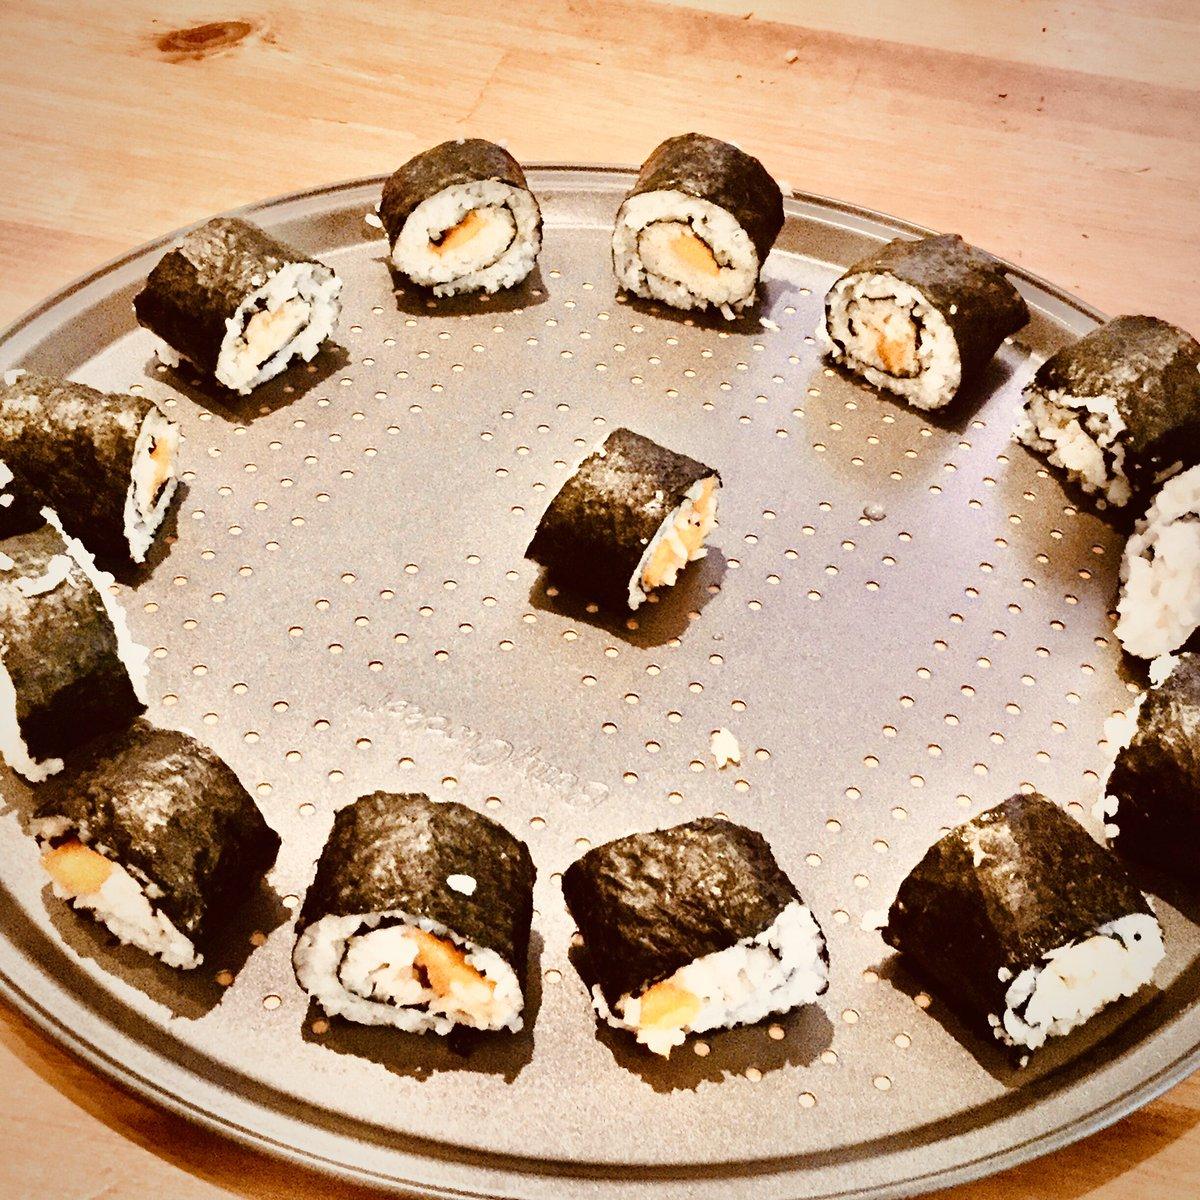 homemade sushi timeeee  #homemade #sushi #yummy pic.twitter.com/XS8YAaK8w0